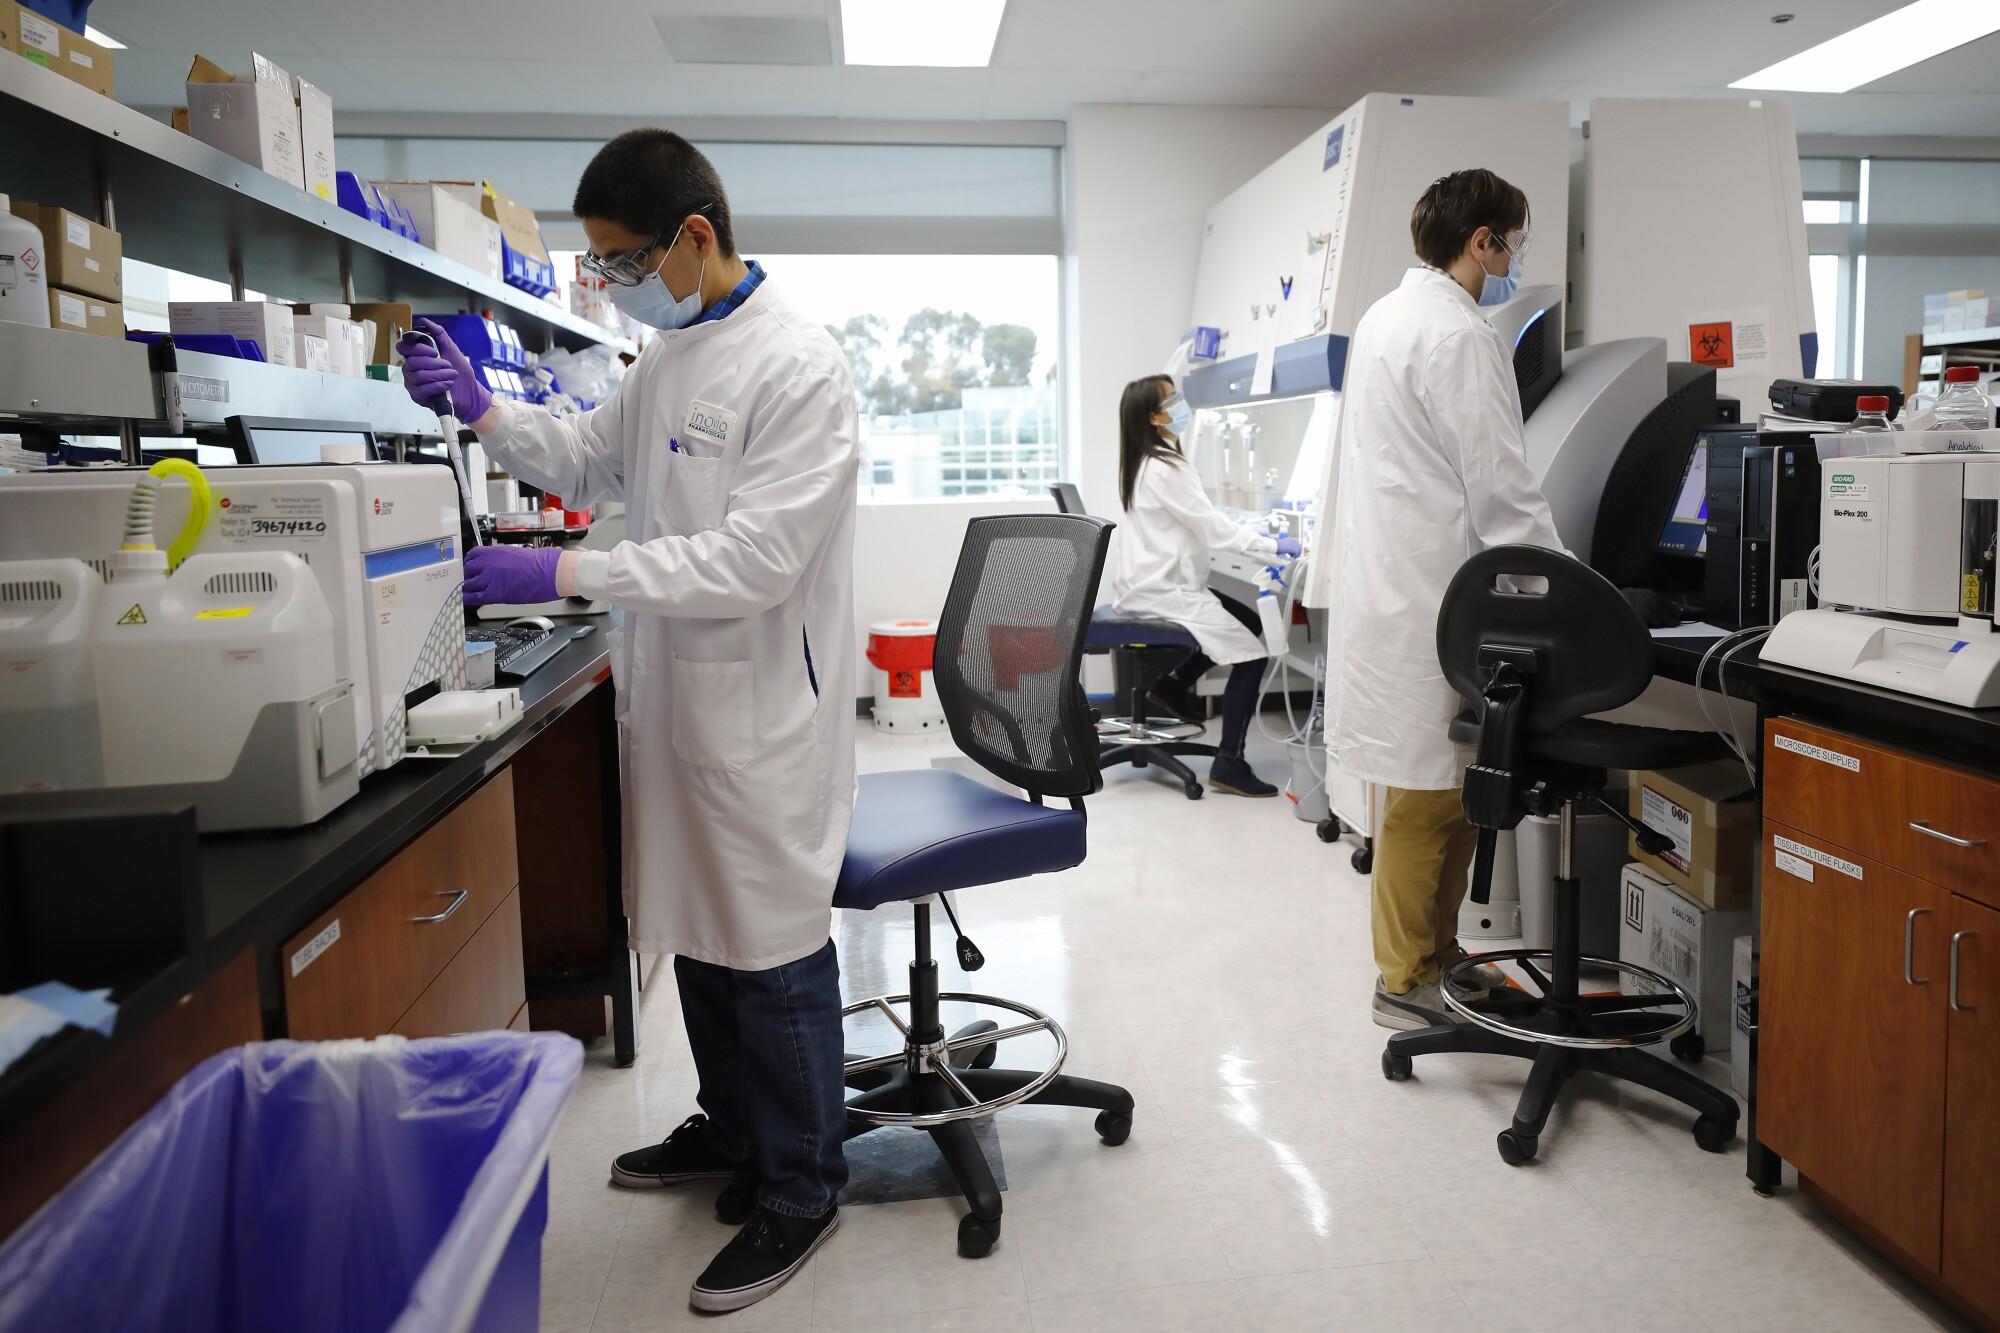 Inovio Pharmaceuticals, a biotech company in San Diego